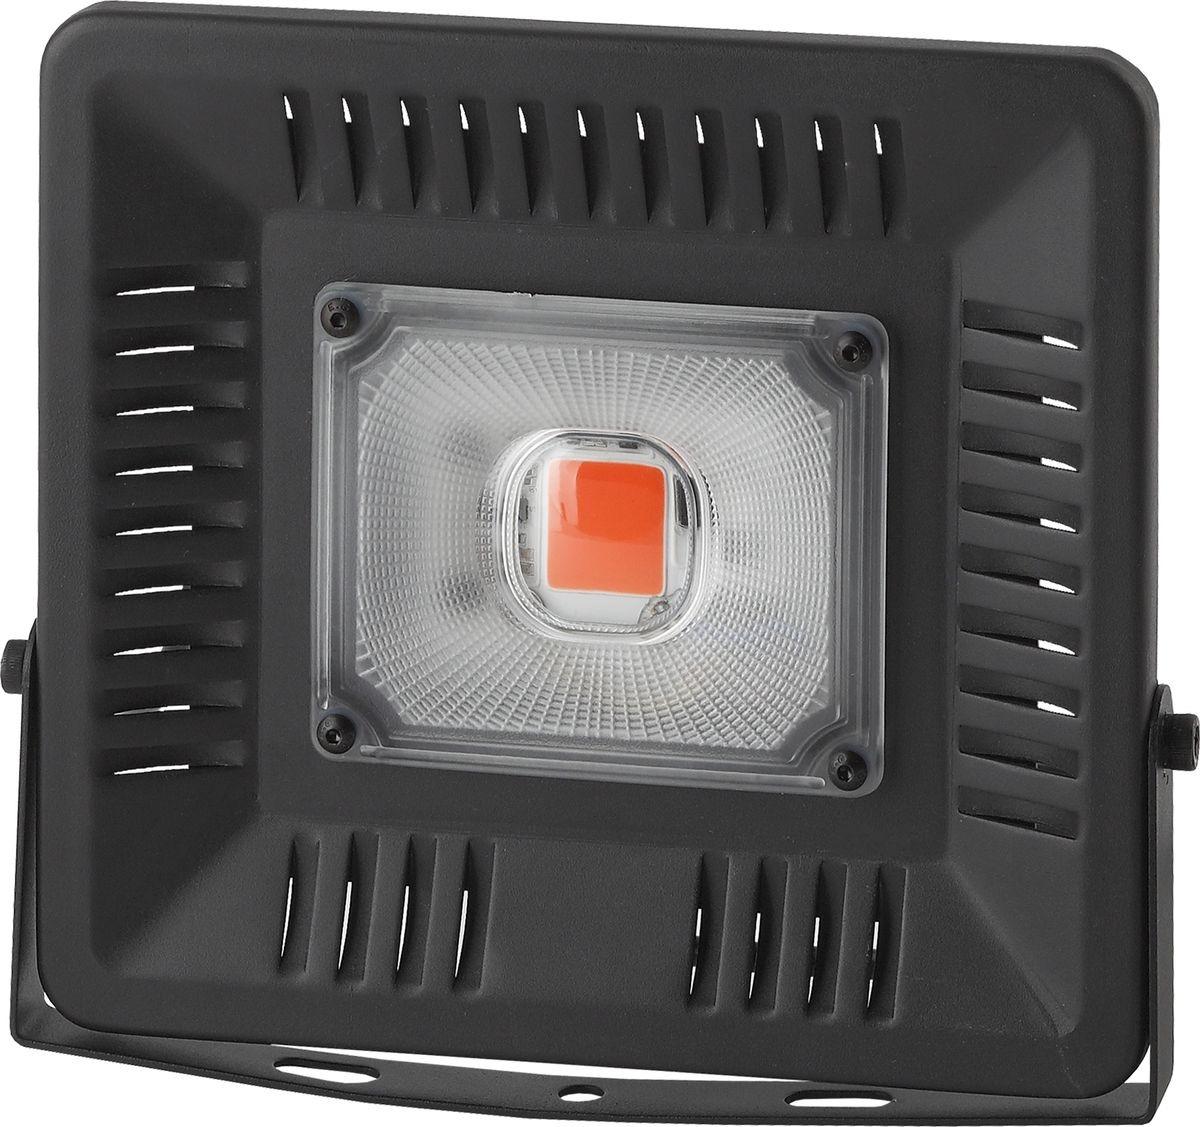 Прожектор ЭРА Fito-50W-LED BLUERED, 50 Вт прожектор эра 30 вт